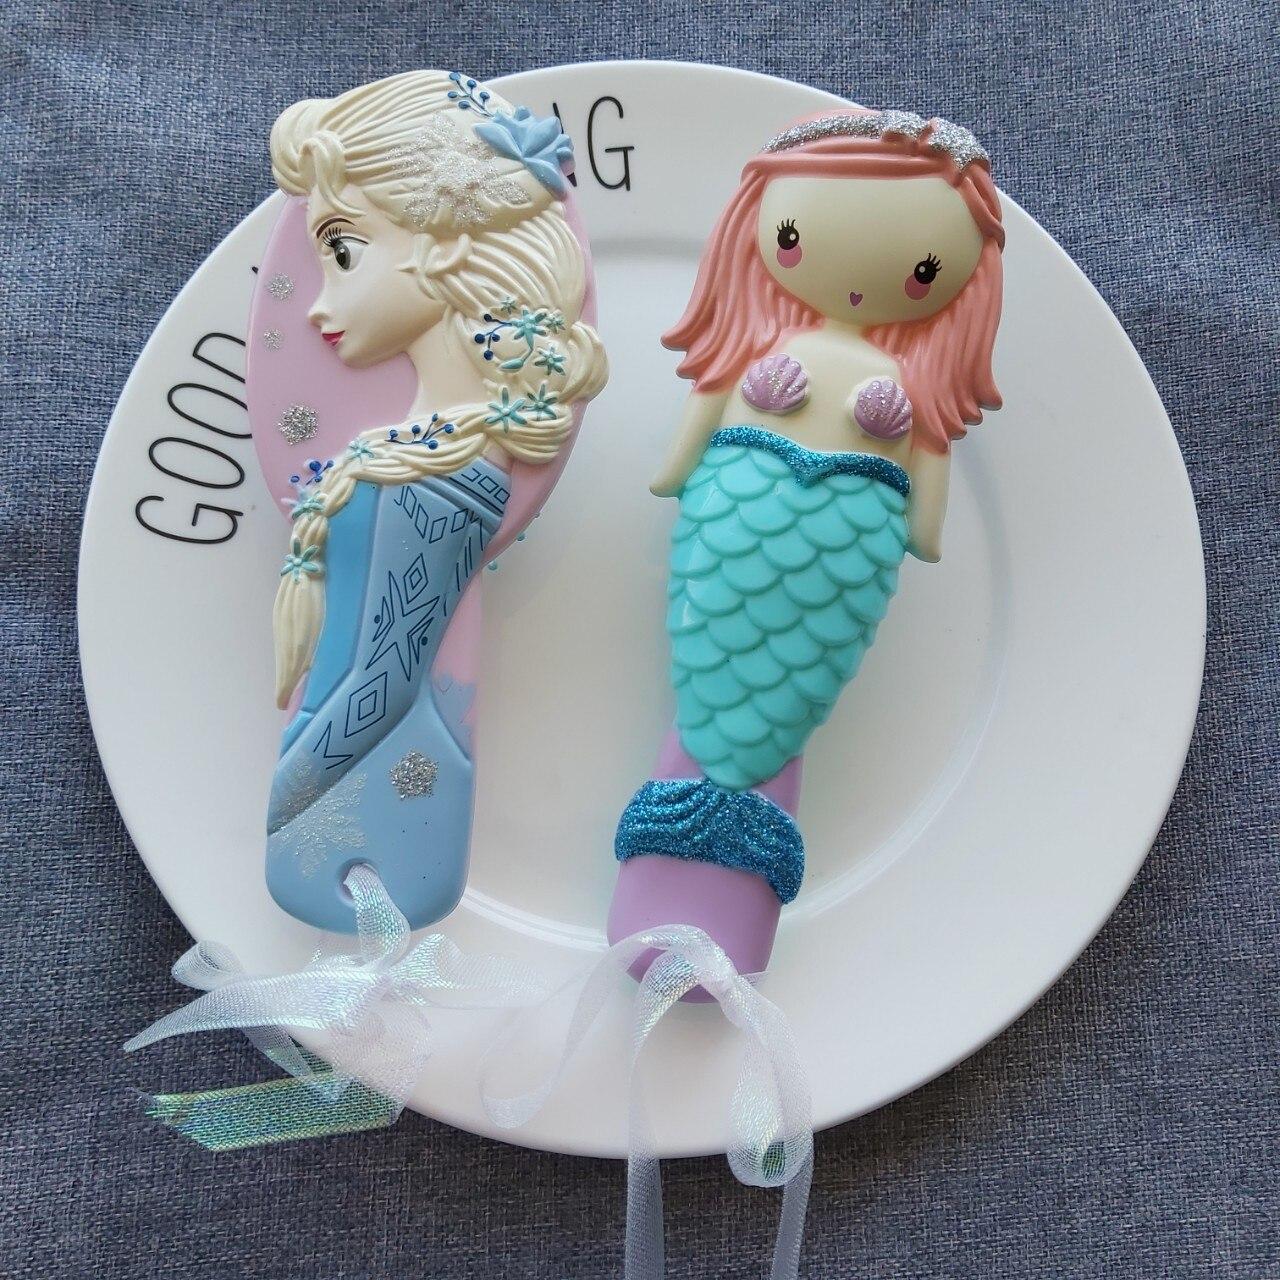 Frozen 2 Kids Toys For Girl Mermaid Cute Elsa Princess Baby Hair Comb New Cartoon Cosplay Children Toys Photo Prop Birthday Gift